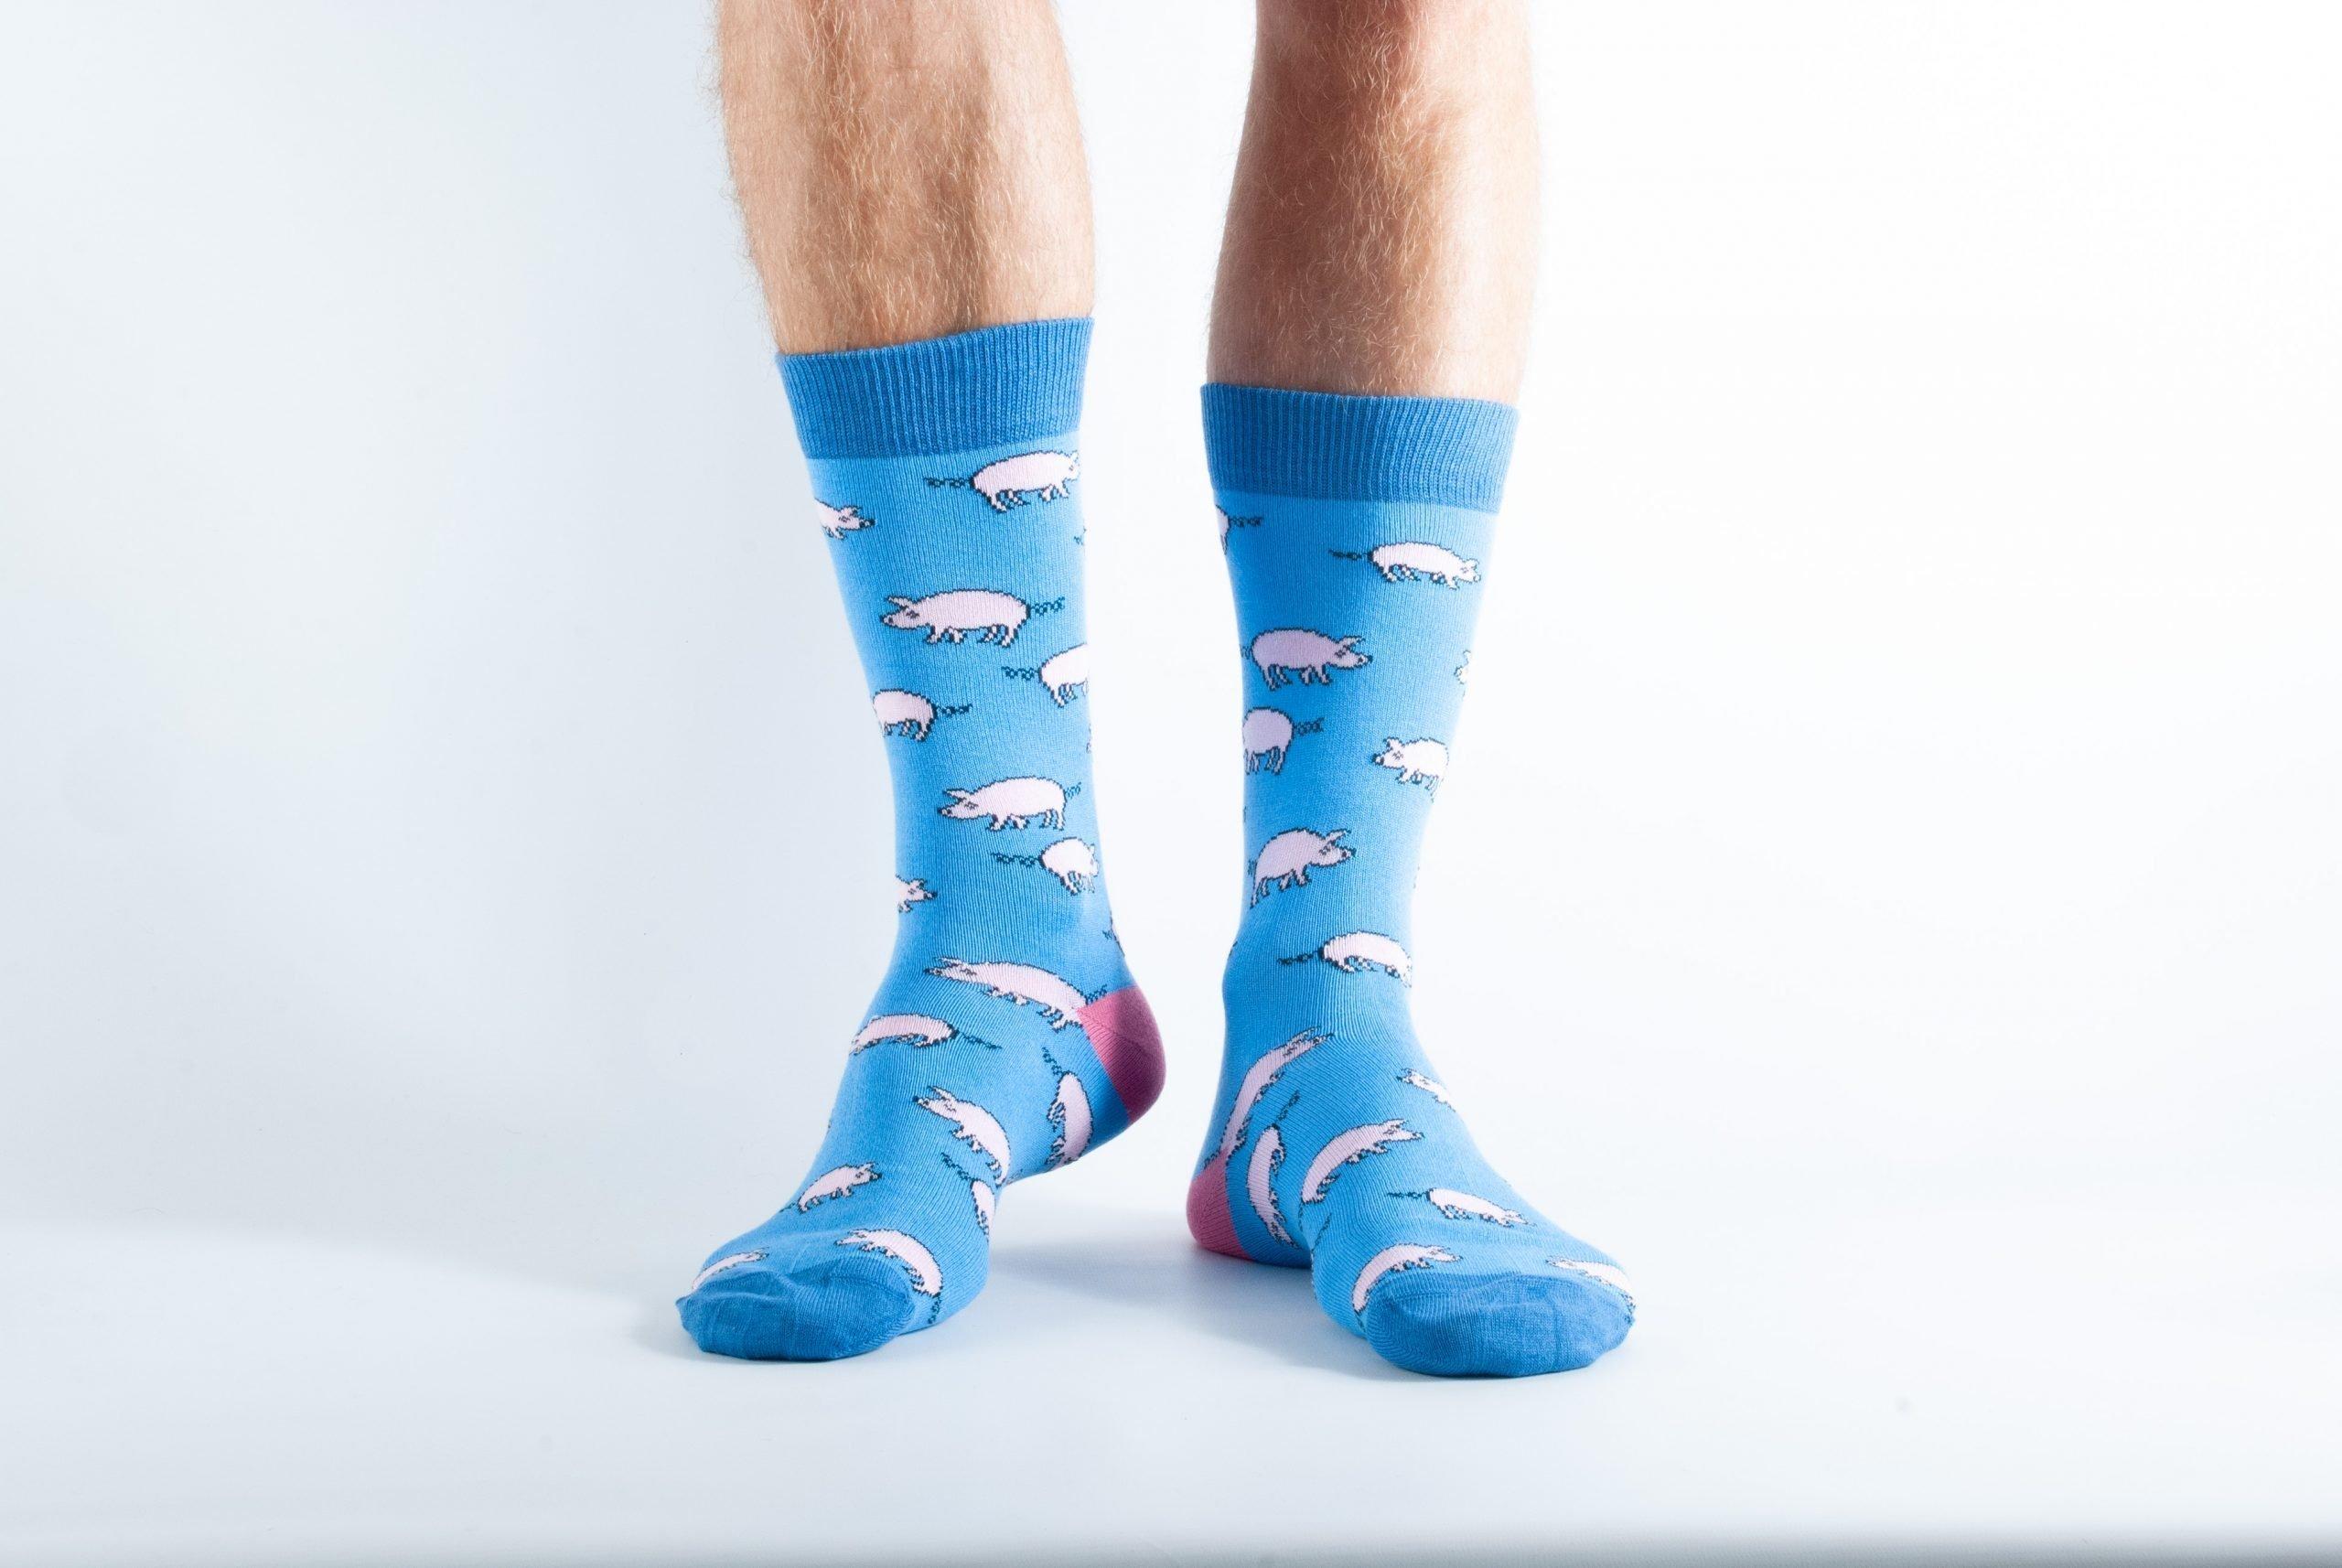 Mens Pig bamboo socks - blue and dark blue